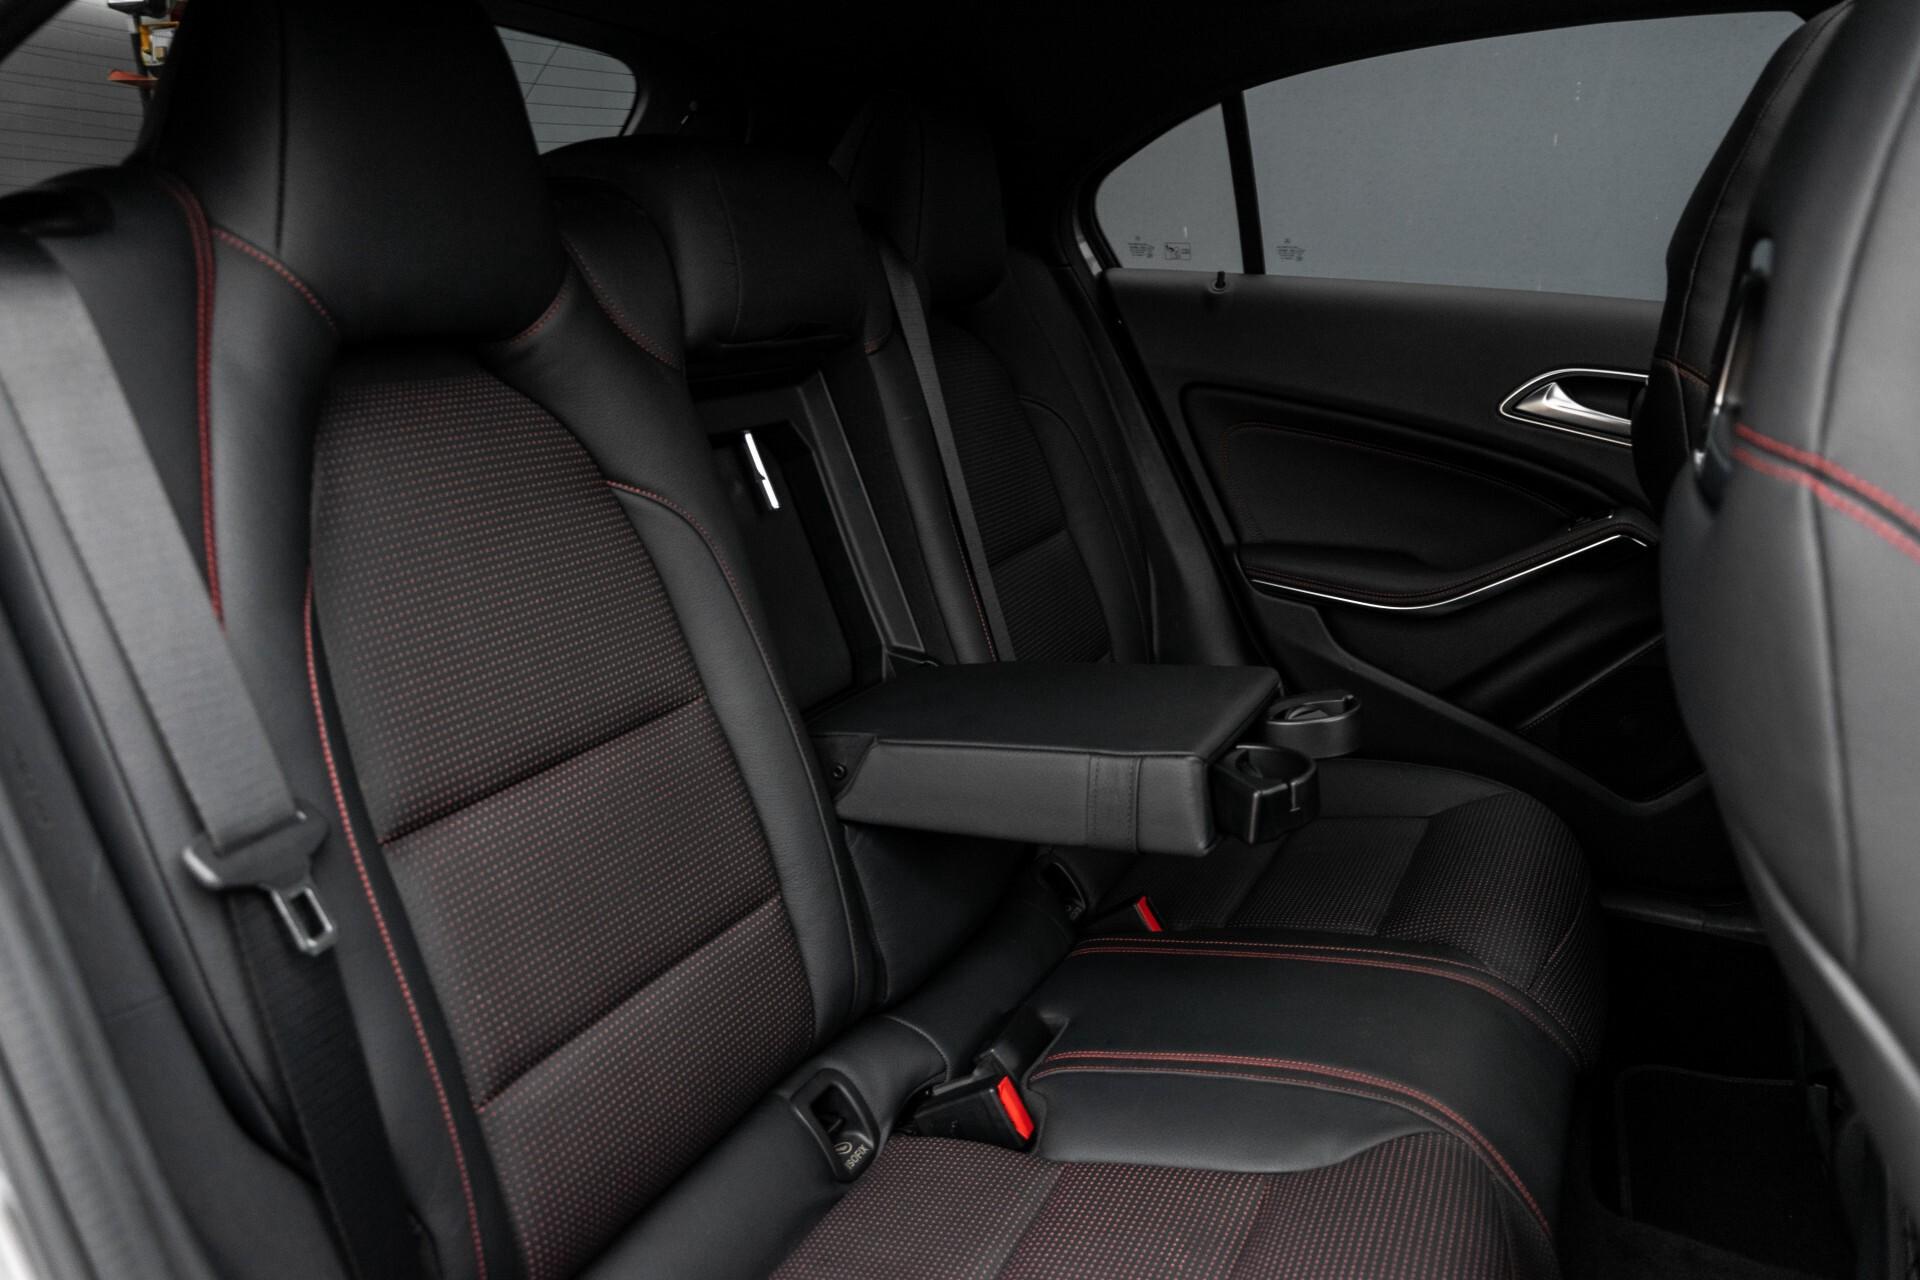 Mercedes-Benz A-Klasse 250 Sport AMG Panorama/Standkachel/Mem/Harman-Kardon/Distronic/Camera/Com Aut7 Foto 6